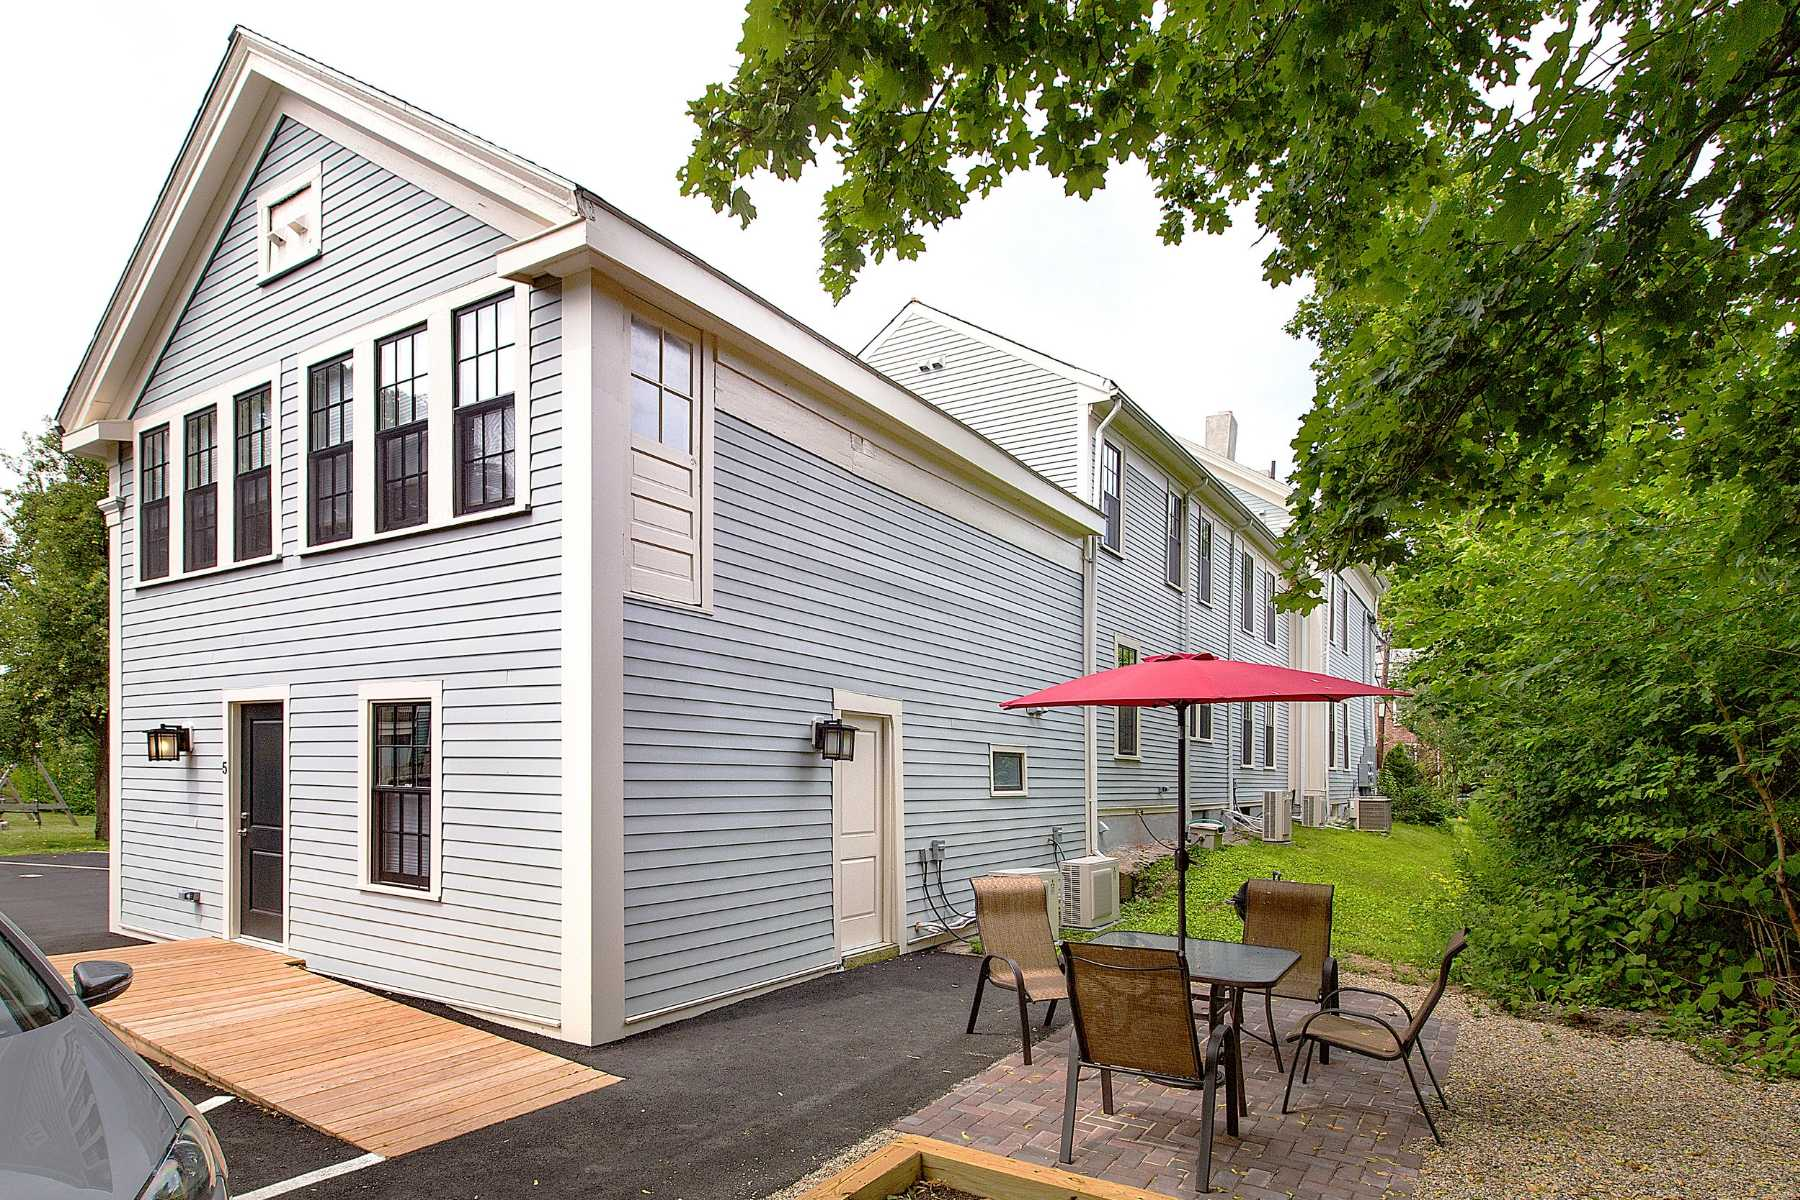 5-CapstoneCommunities-property-13 WinterStreet-Arlington.jpg